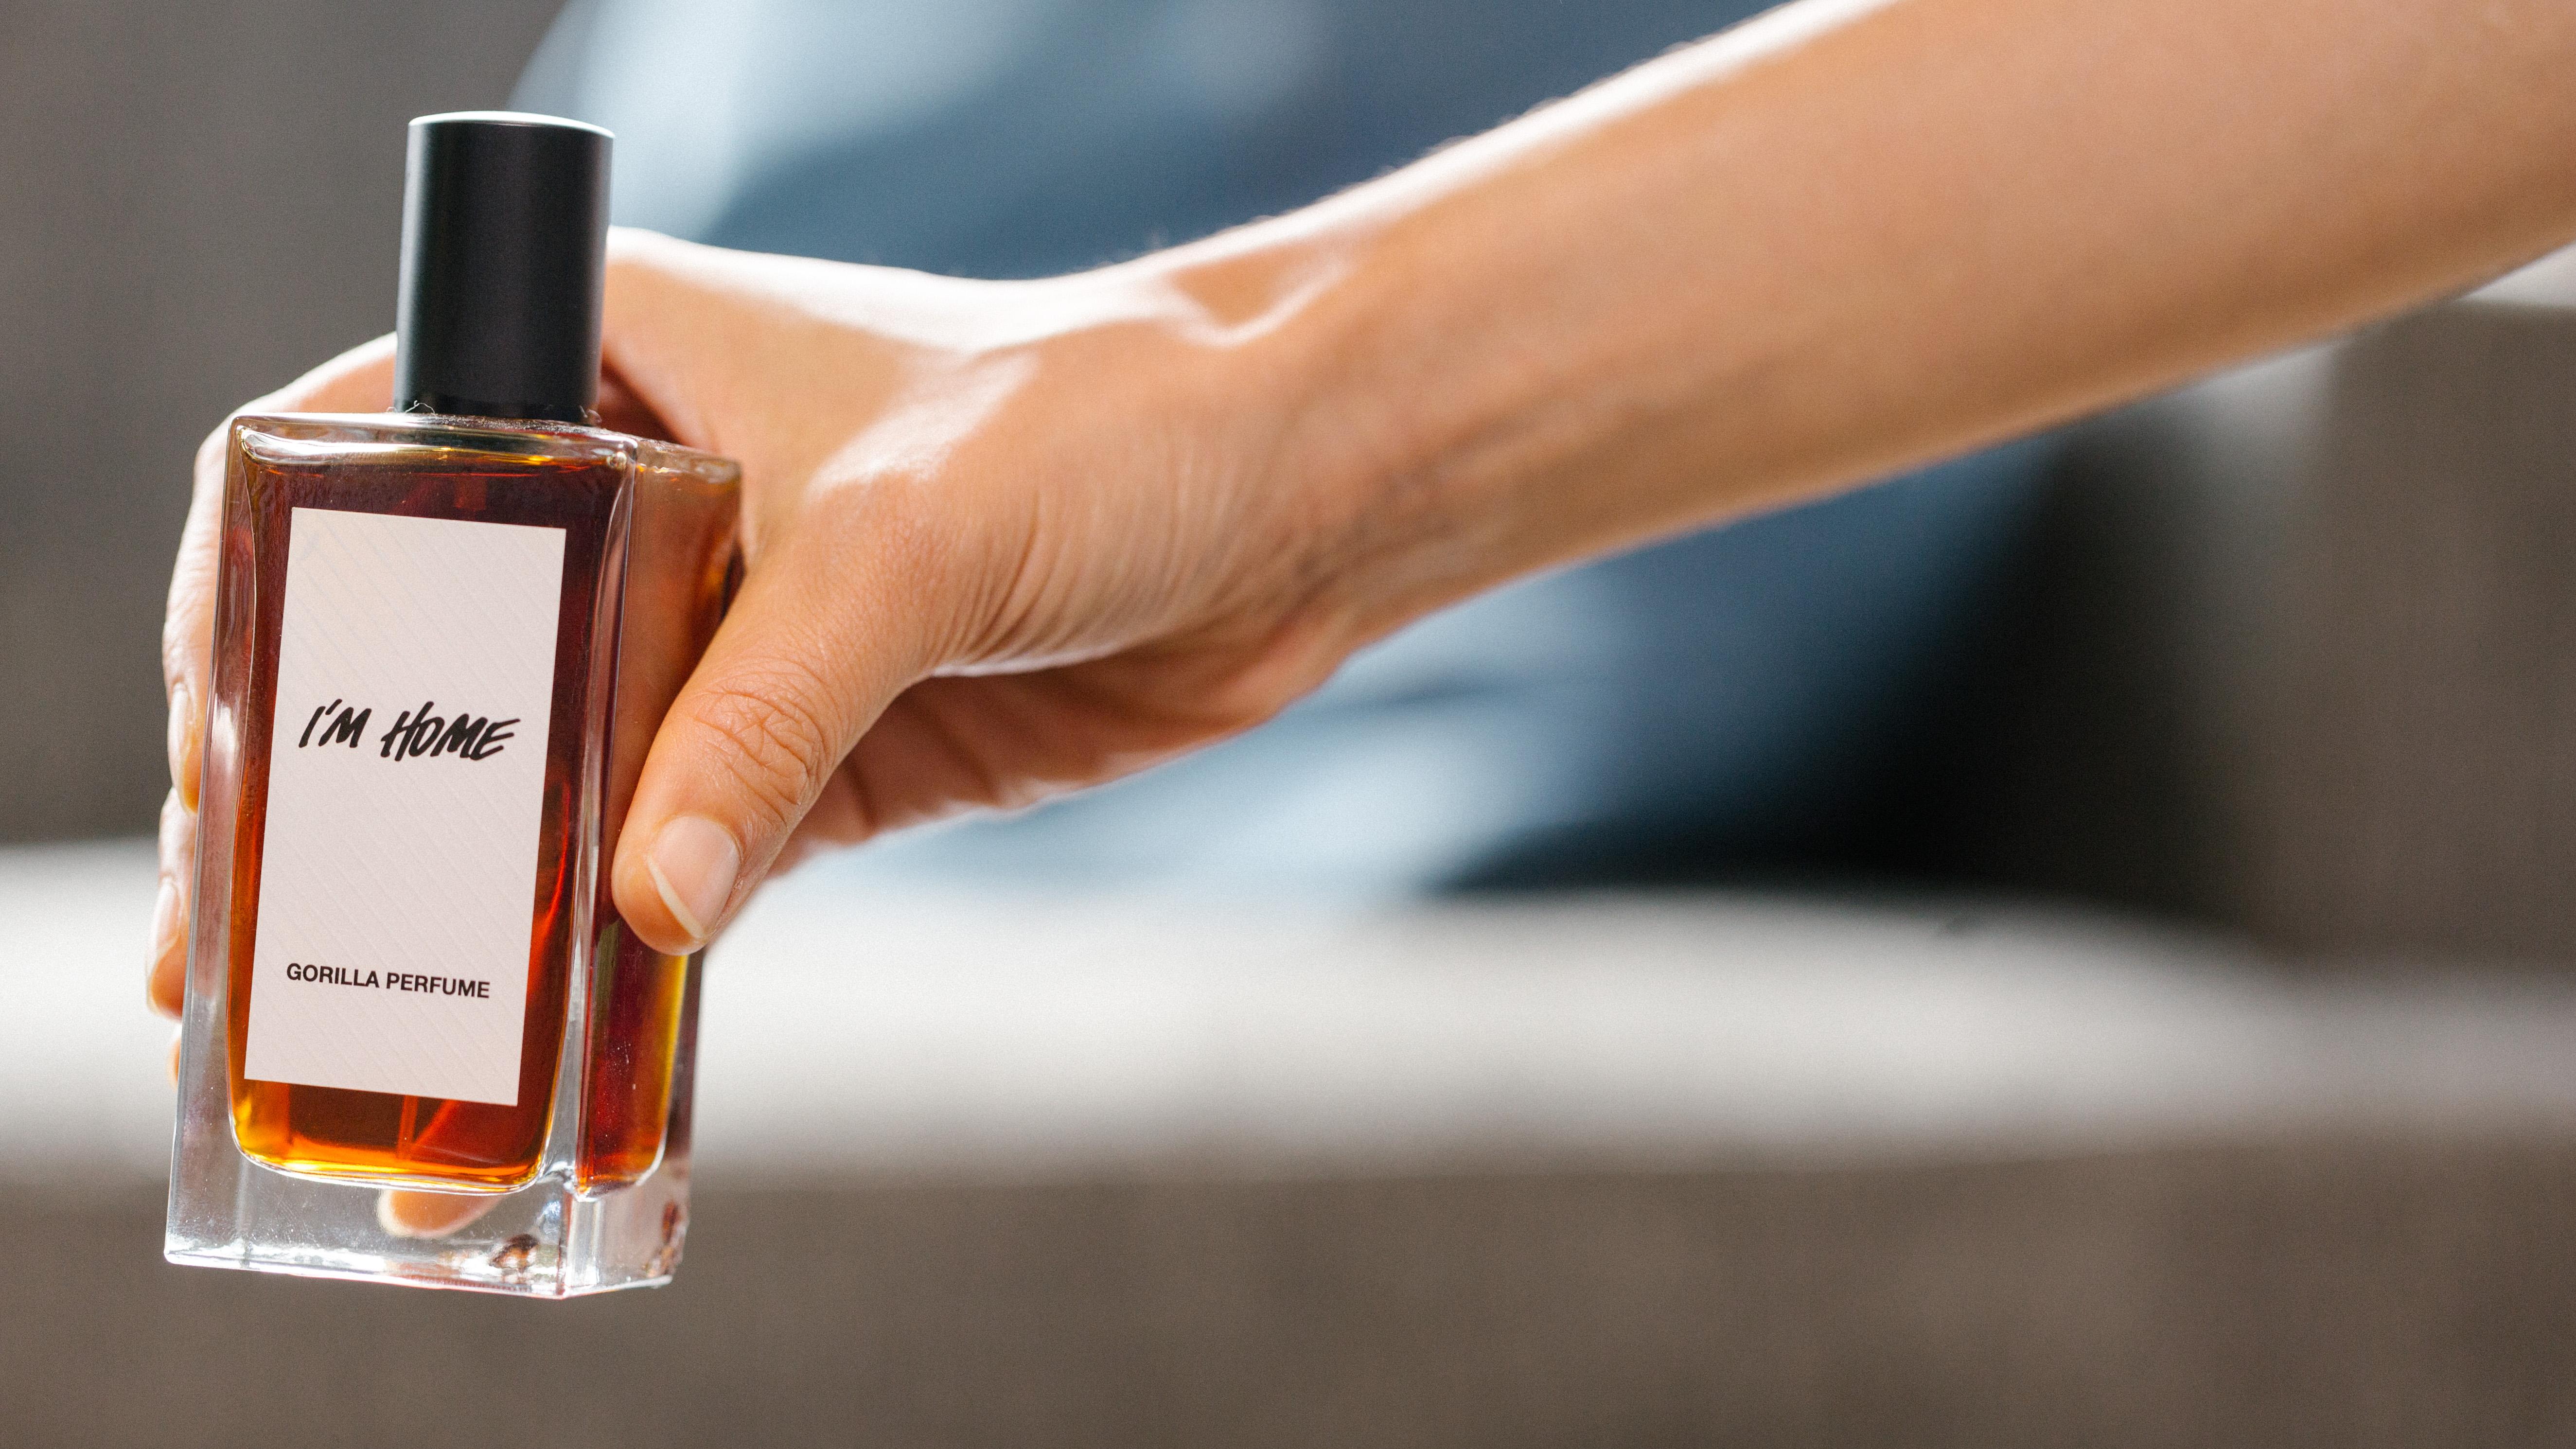 I M Home Perfumes Lush Fresh Handmade Cosmetics Uk